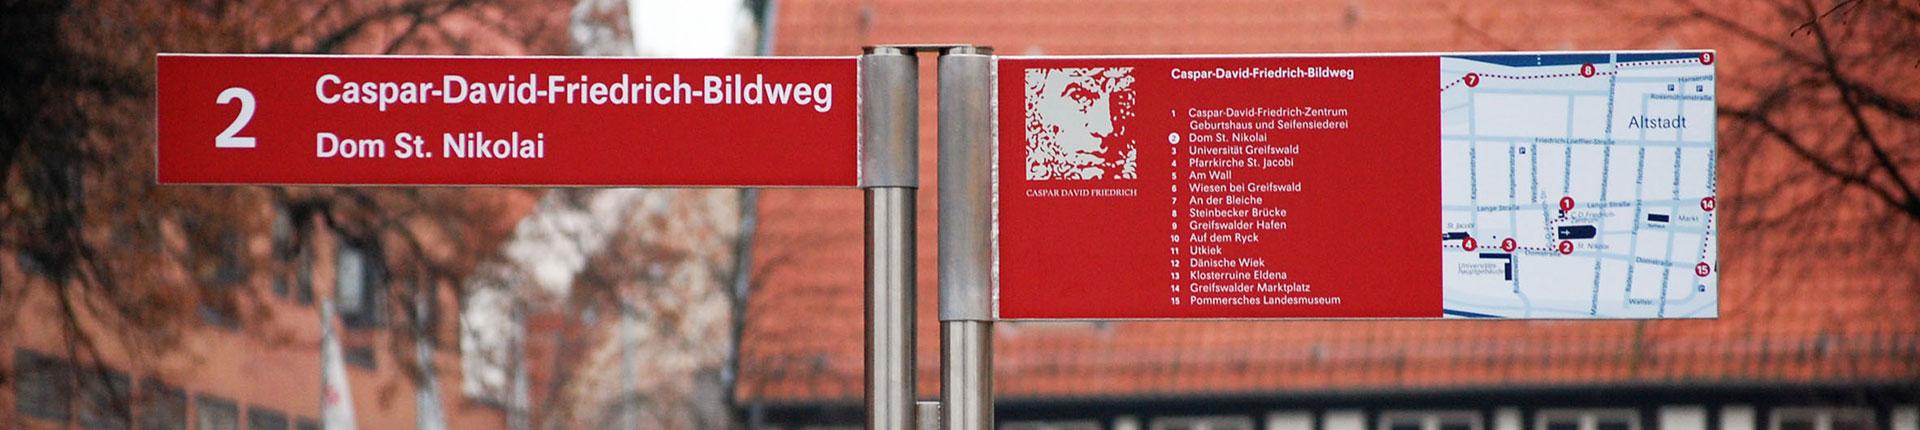 Caspar-David-Friedrich-Bildweg